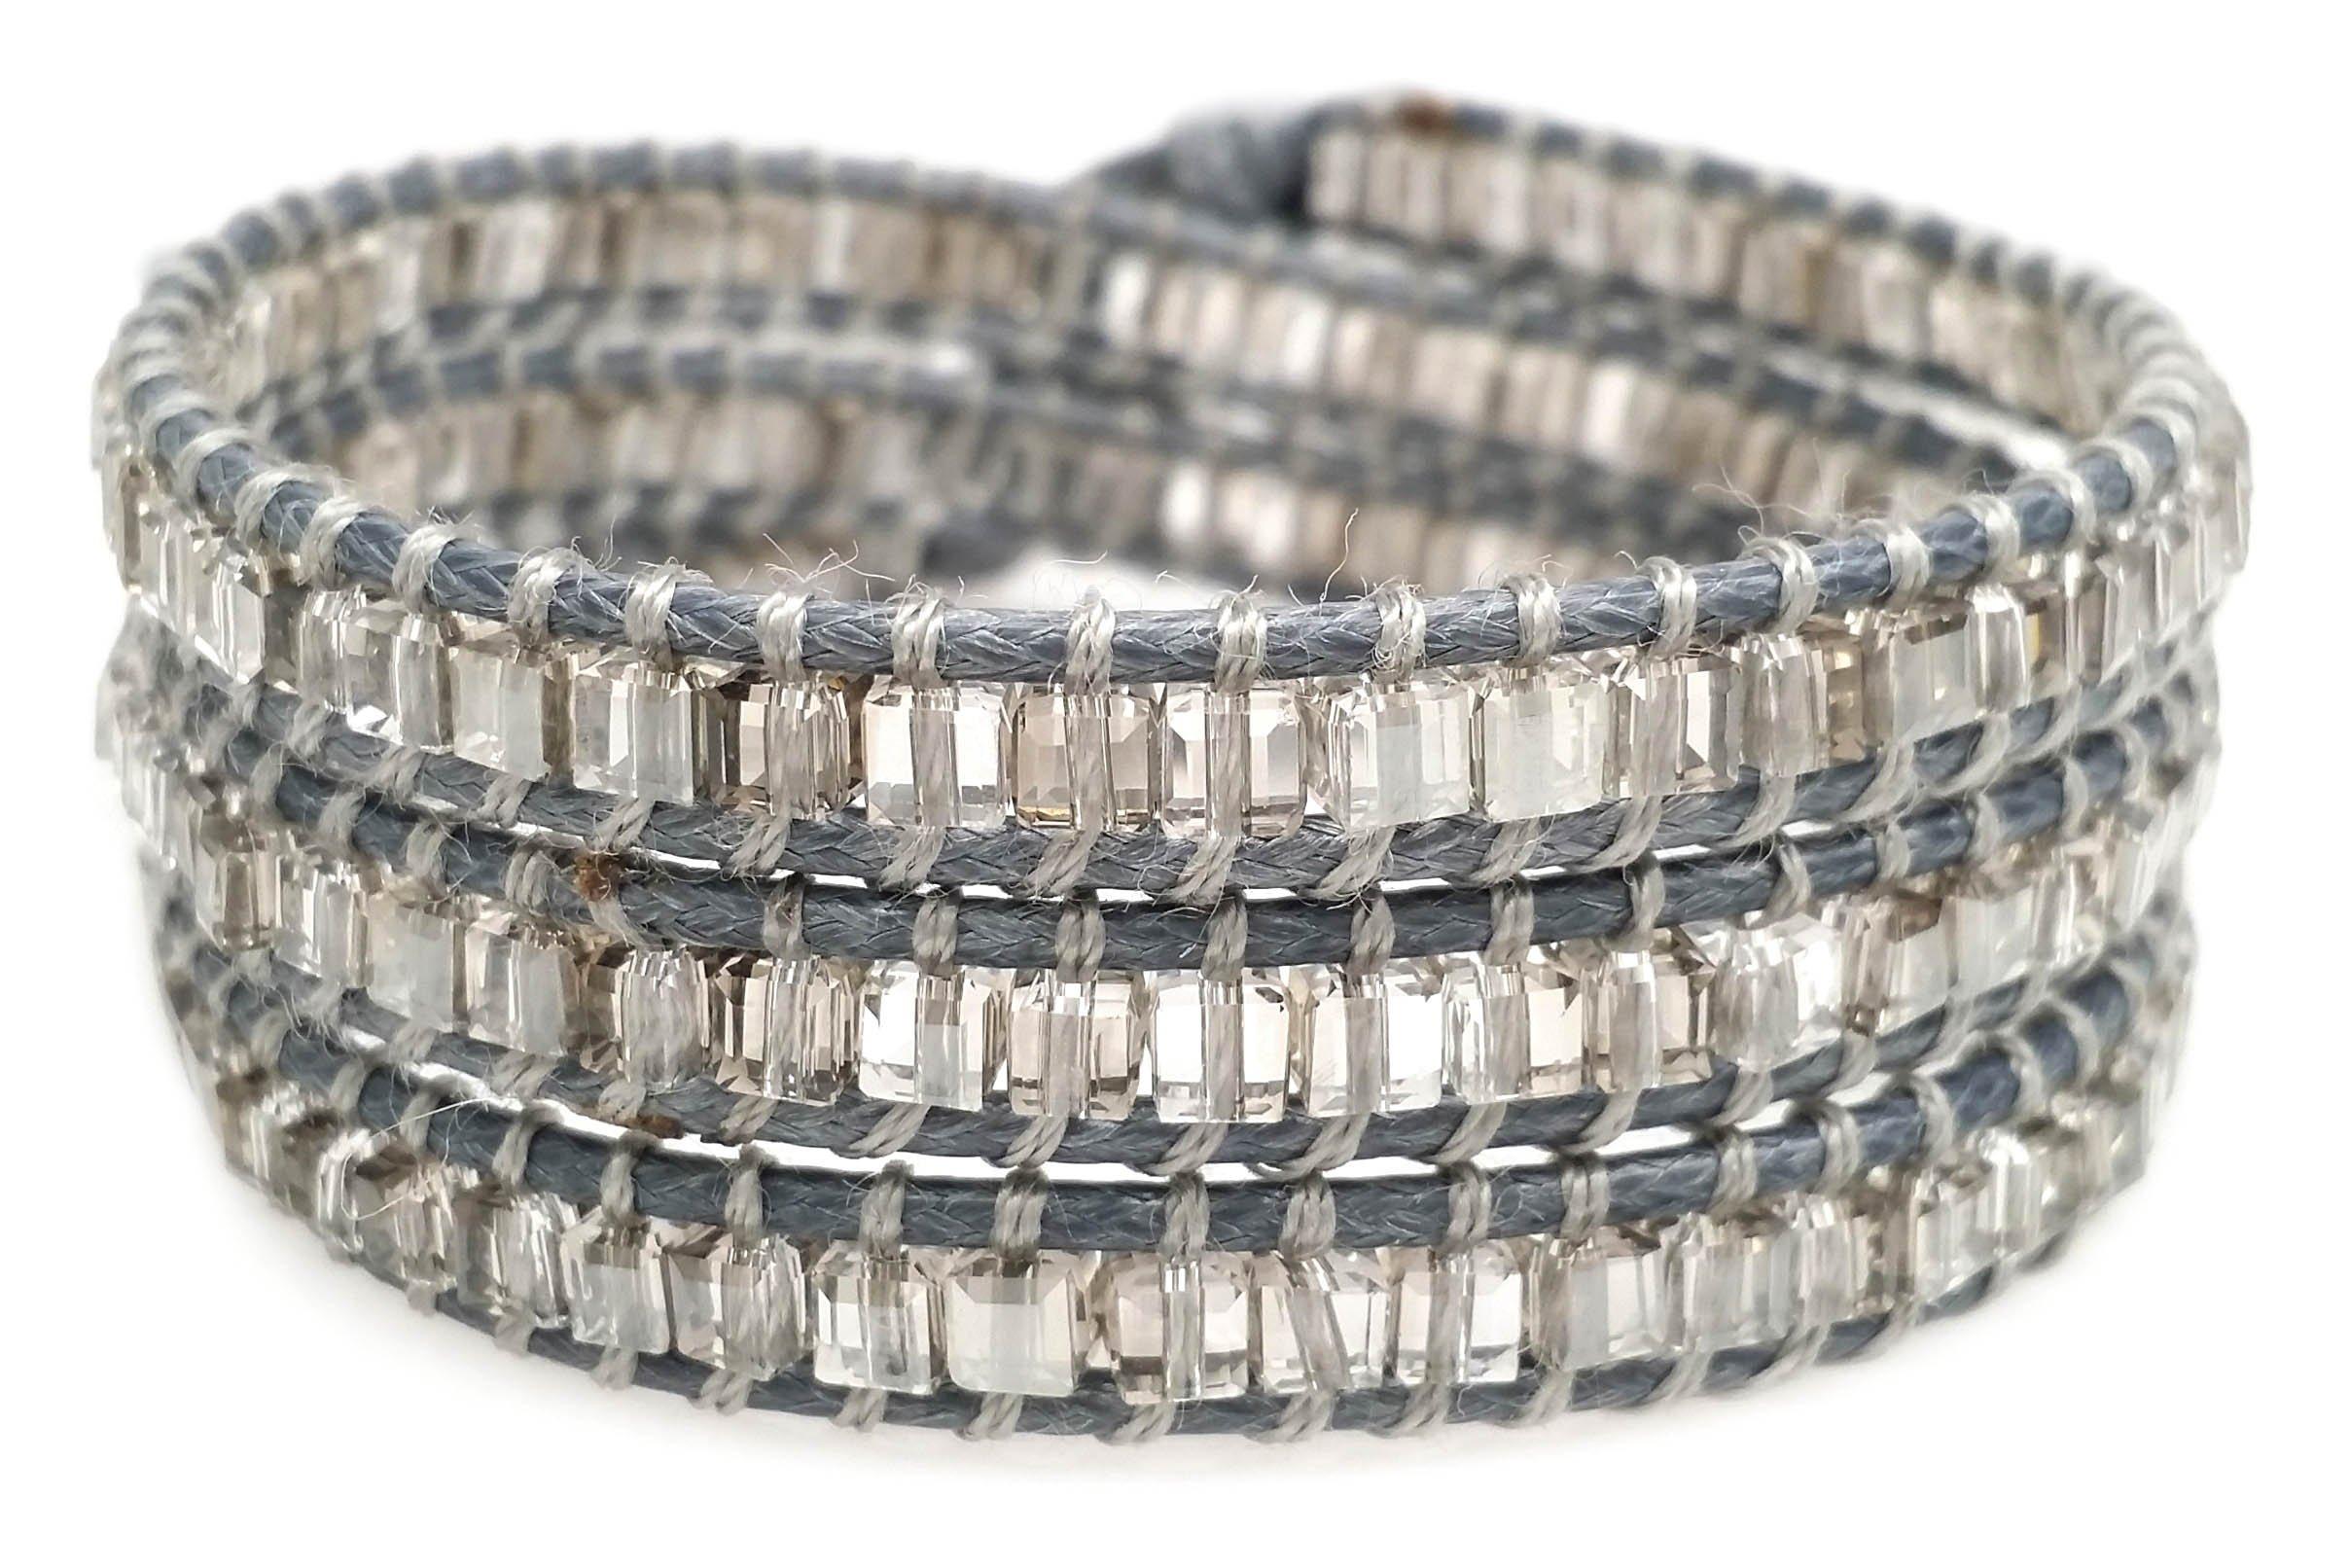 Unisex Beaded Wrap Bracelet, Clear Grey Square Glass Beads, Handmade 3 Wrap